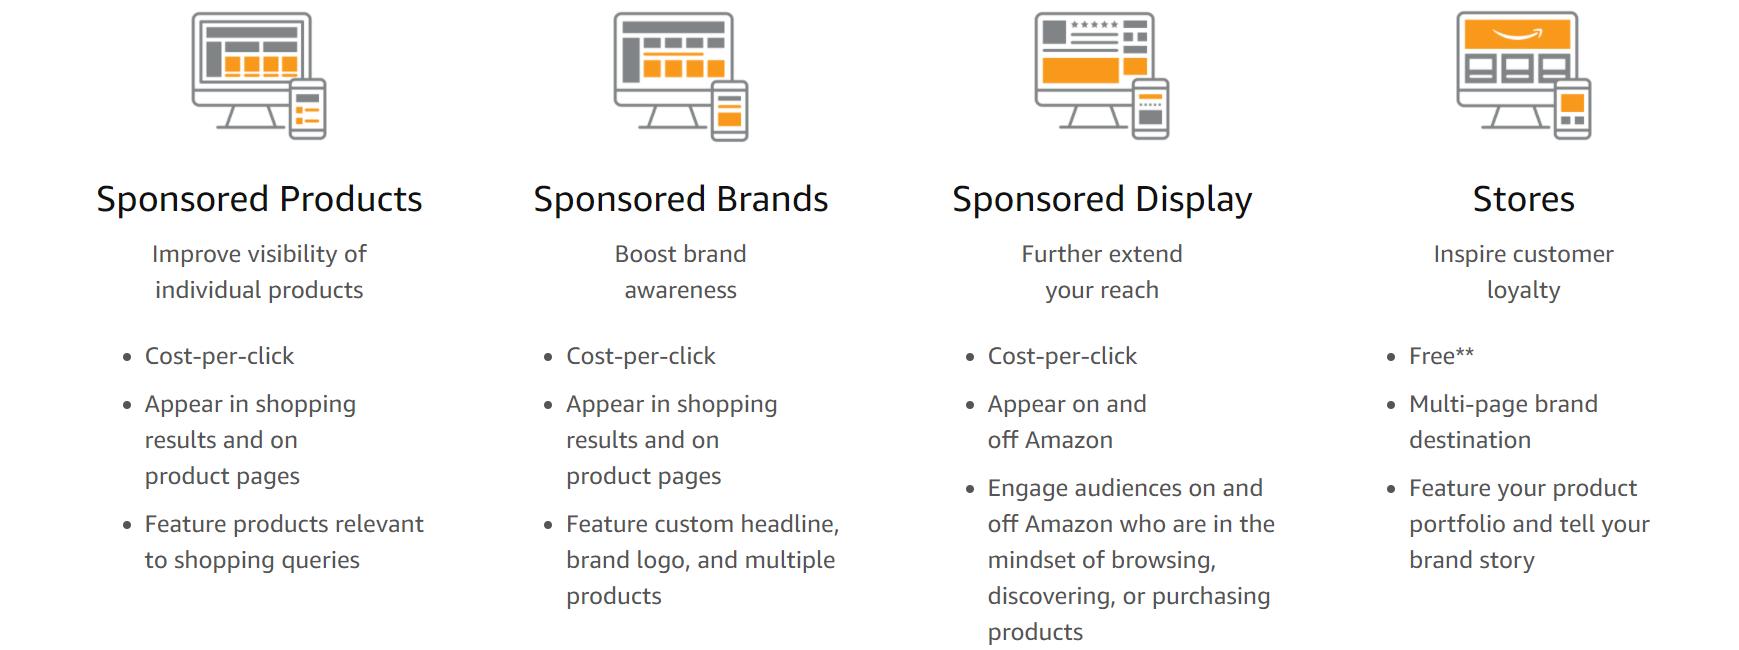 Amazon advertising advertisement types